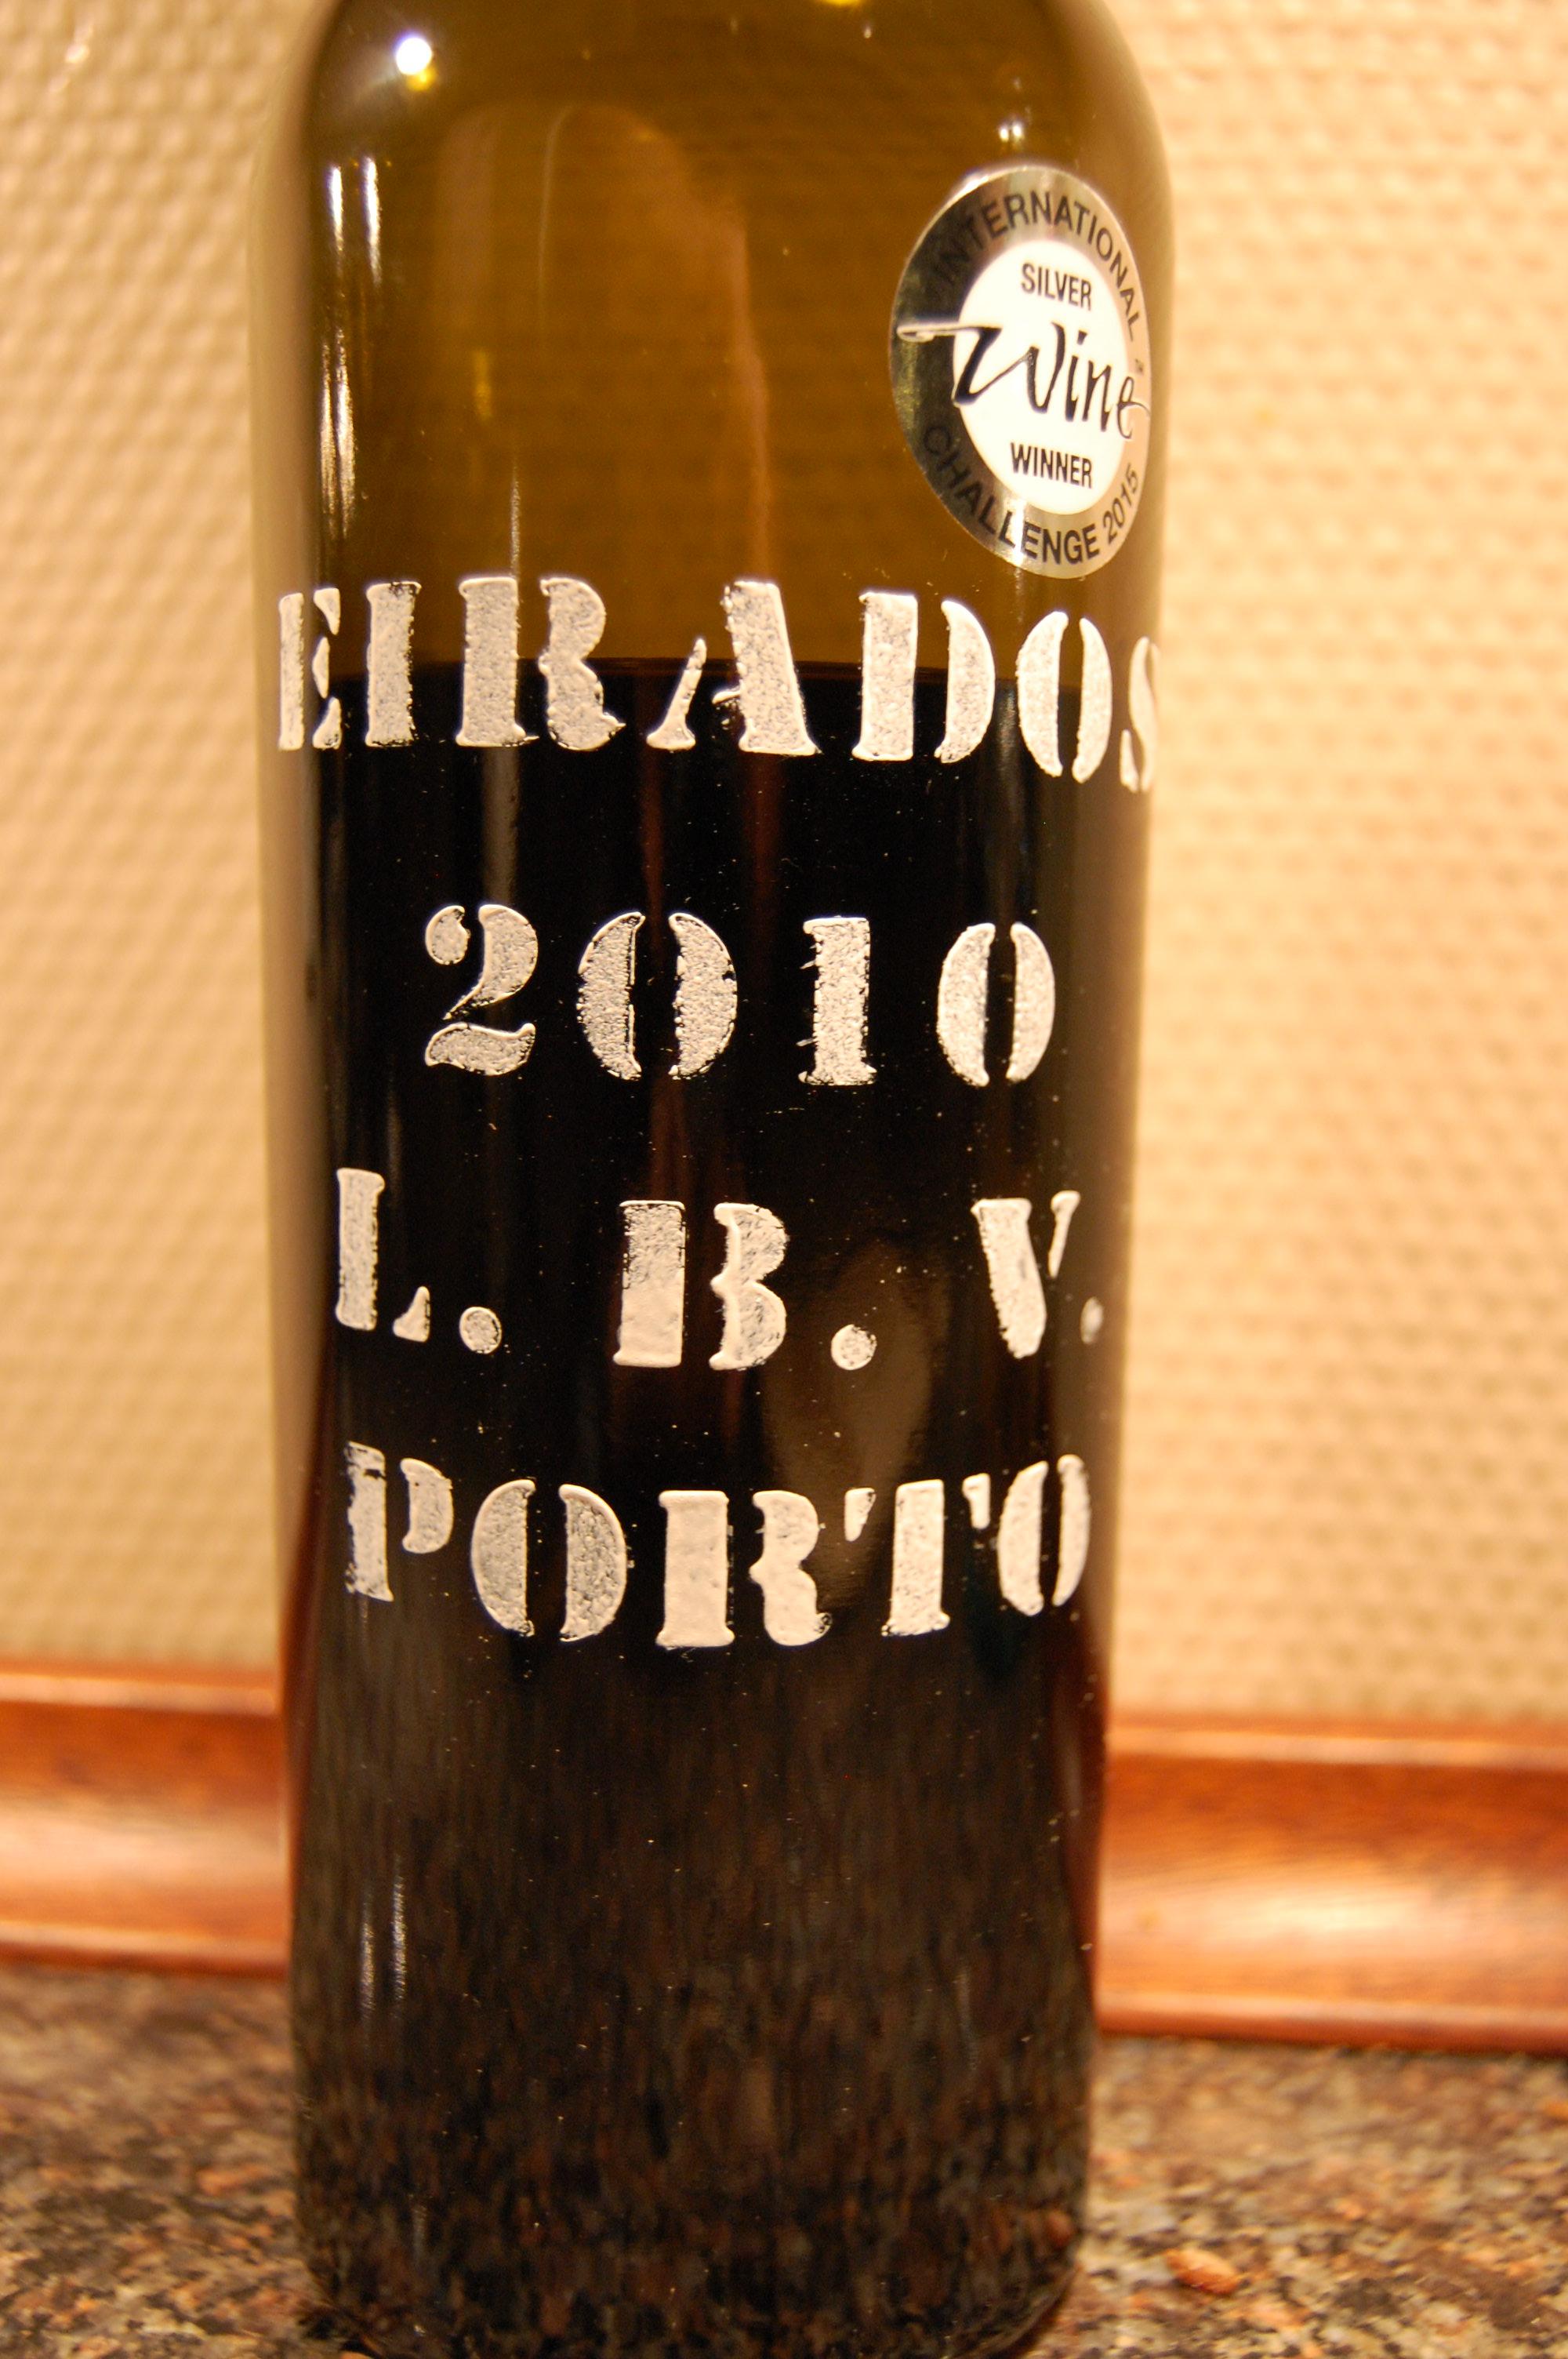 eirados-lbv-2010